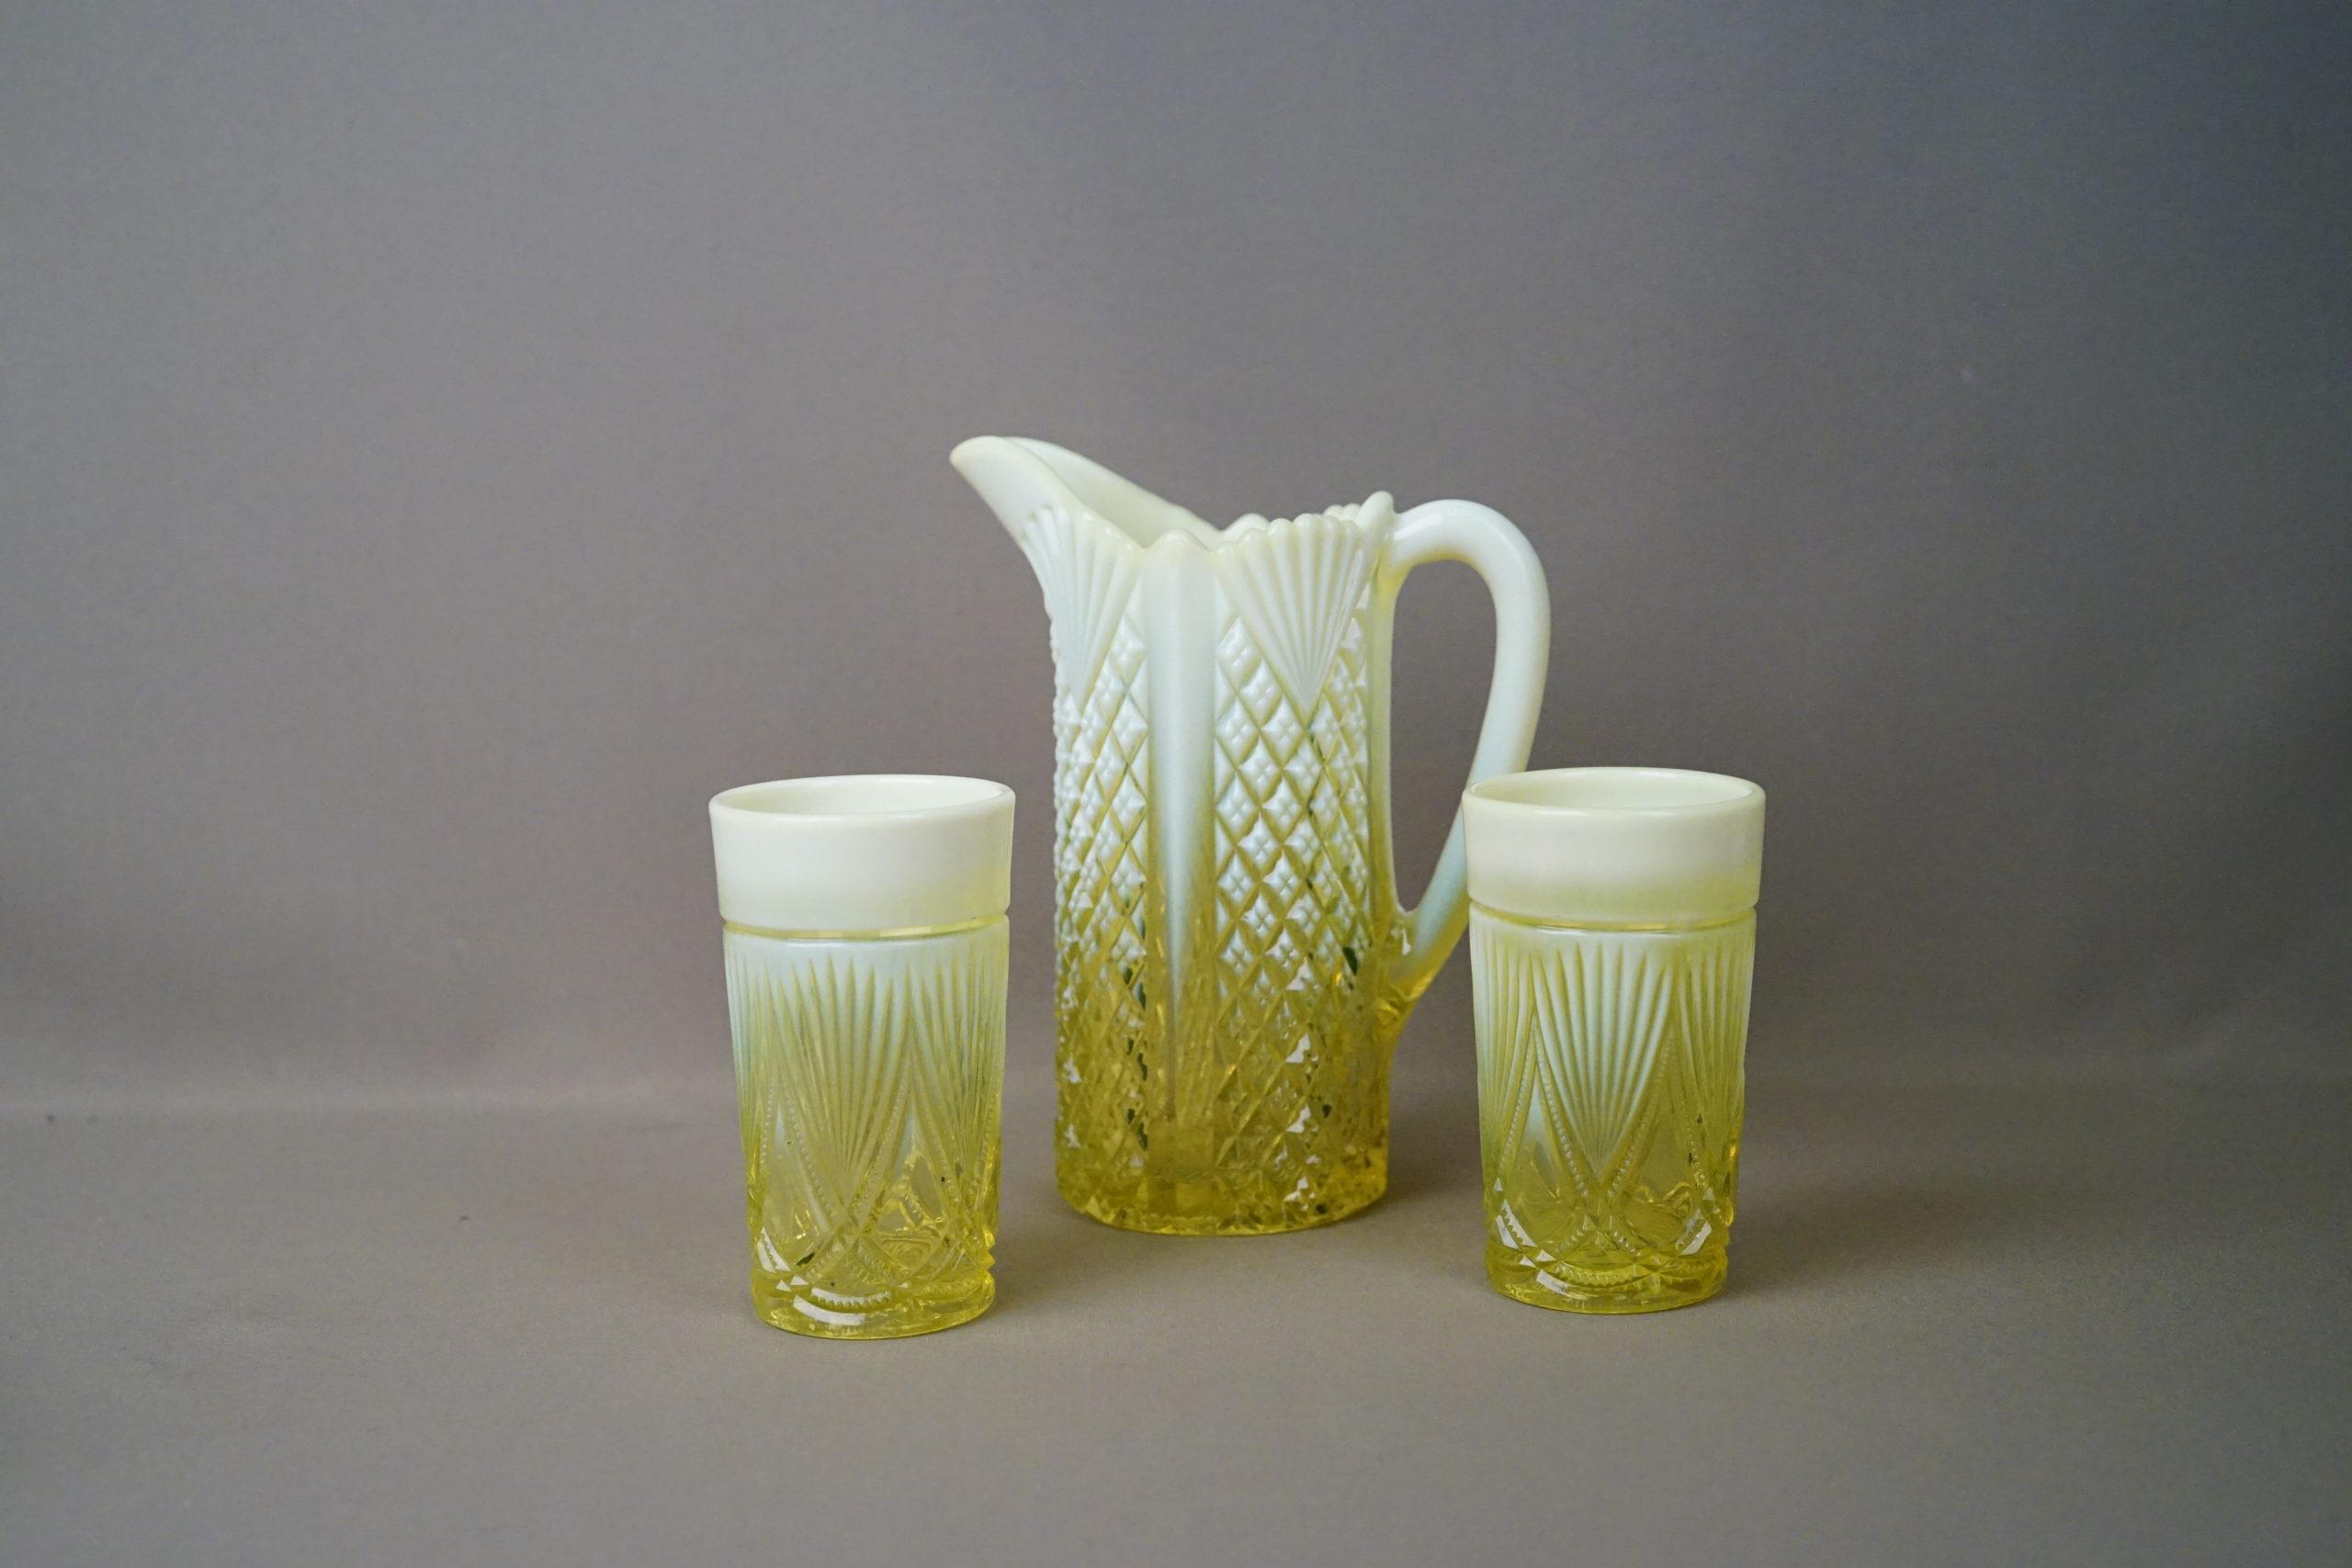 Кувшин и два стакана, «урановое» стекло. Англия, Davidson, начало XX века